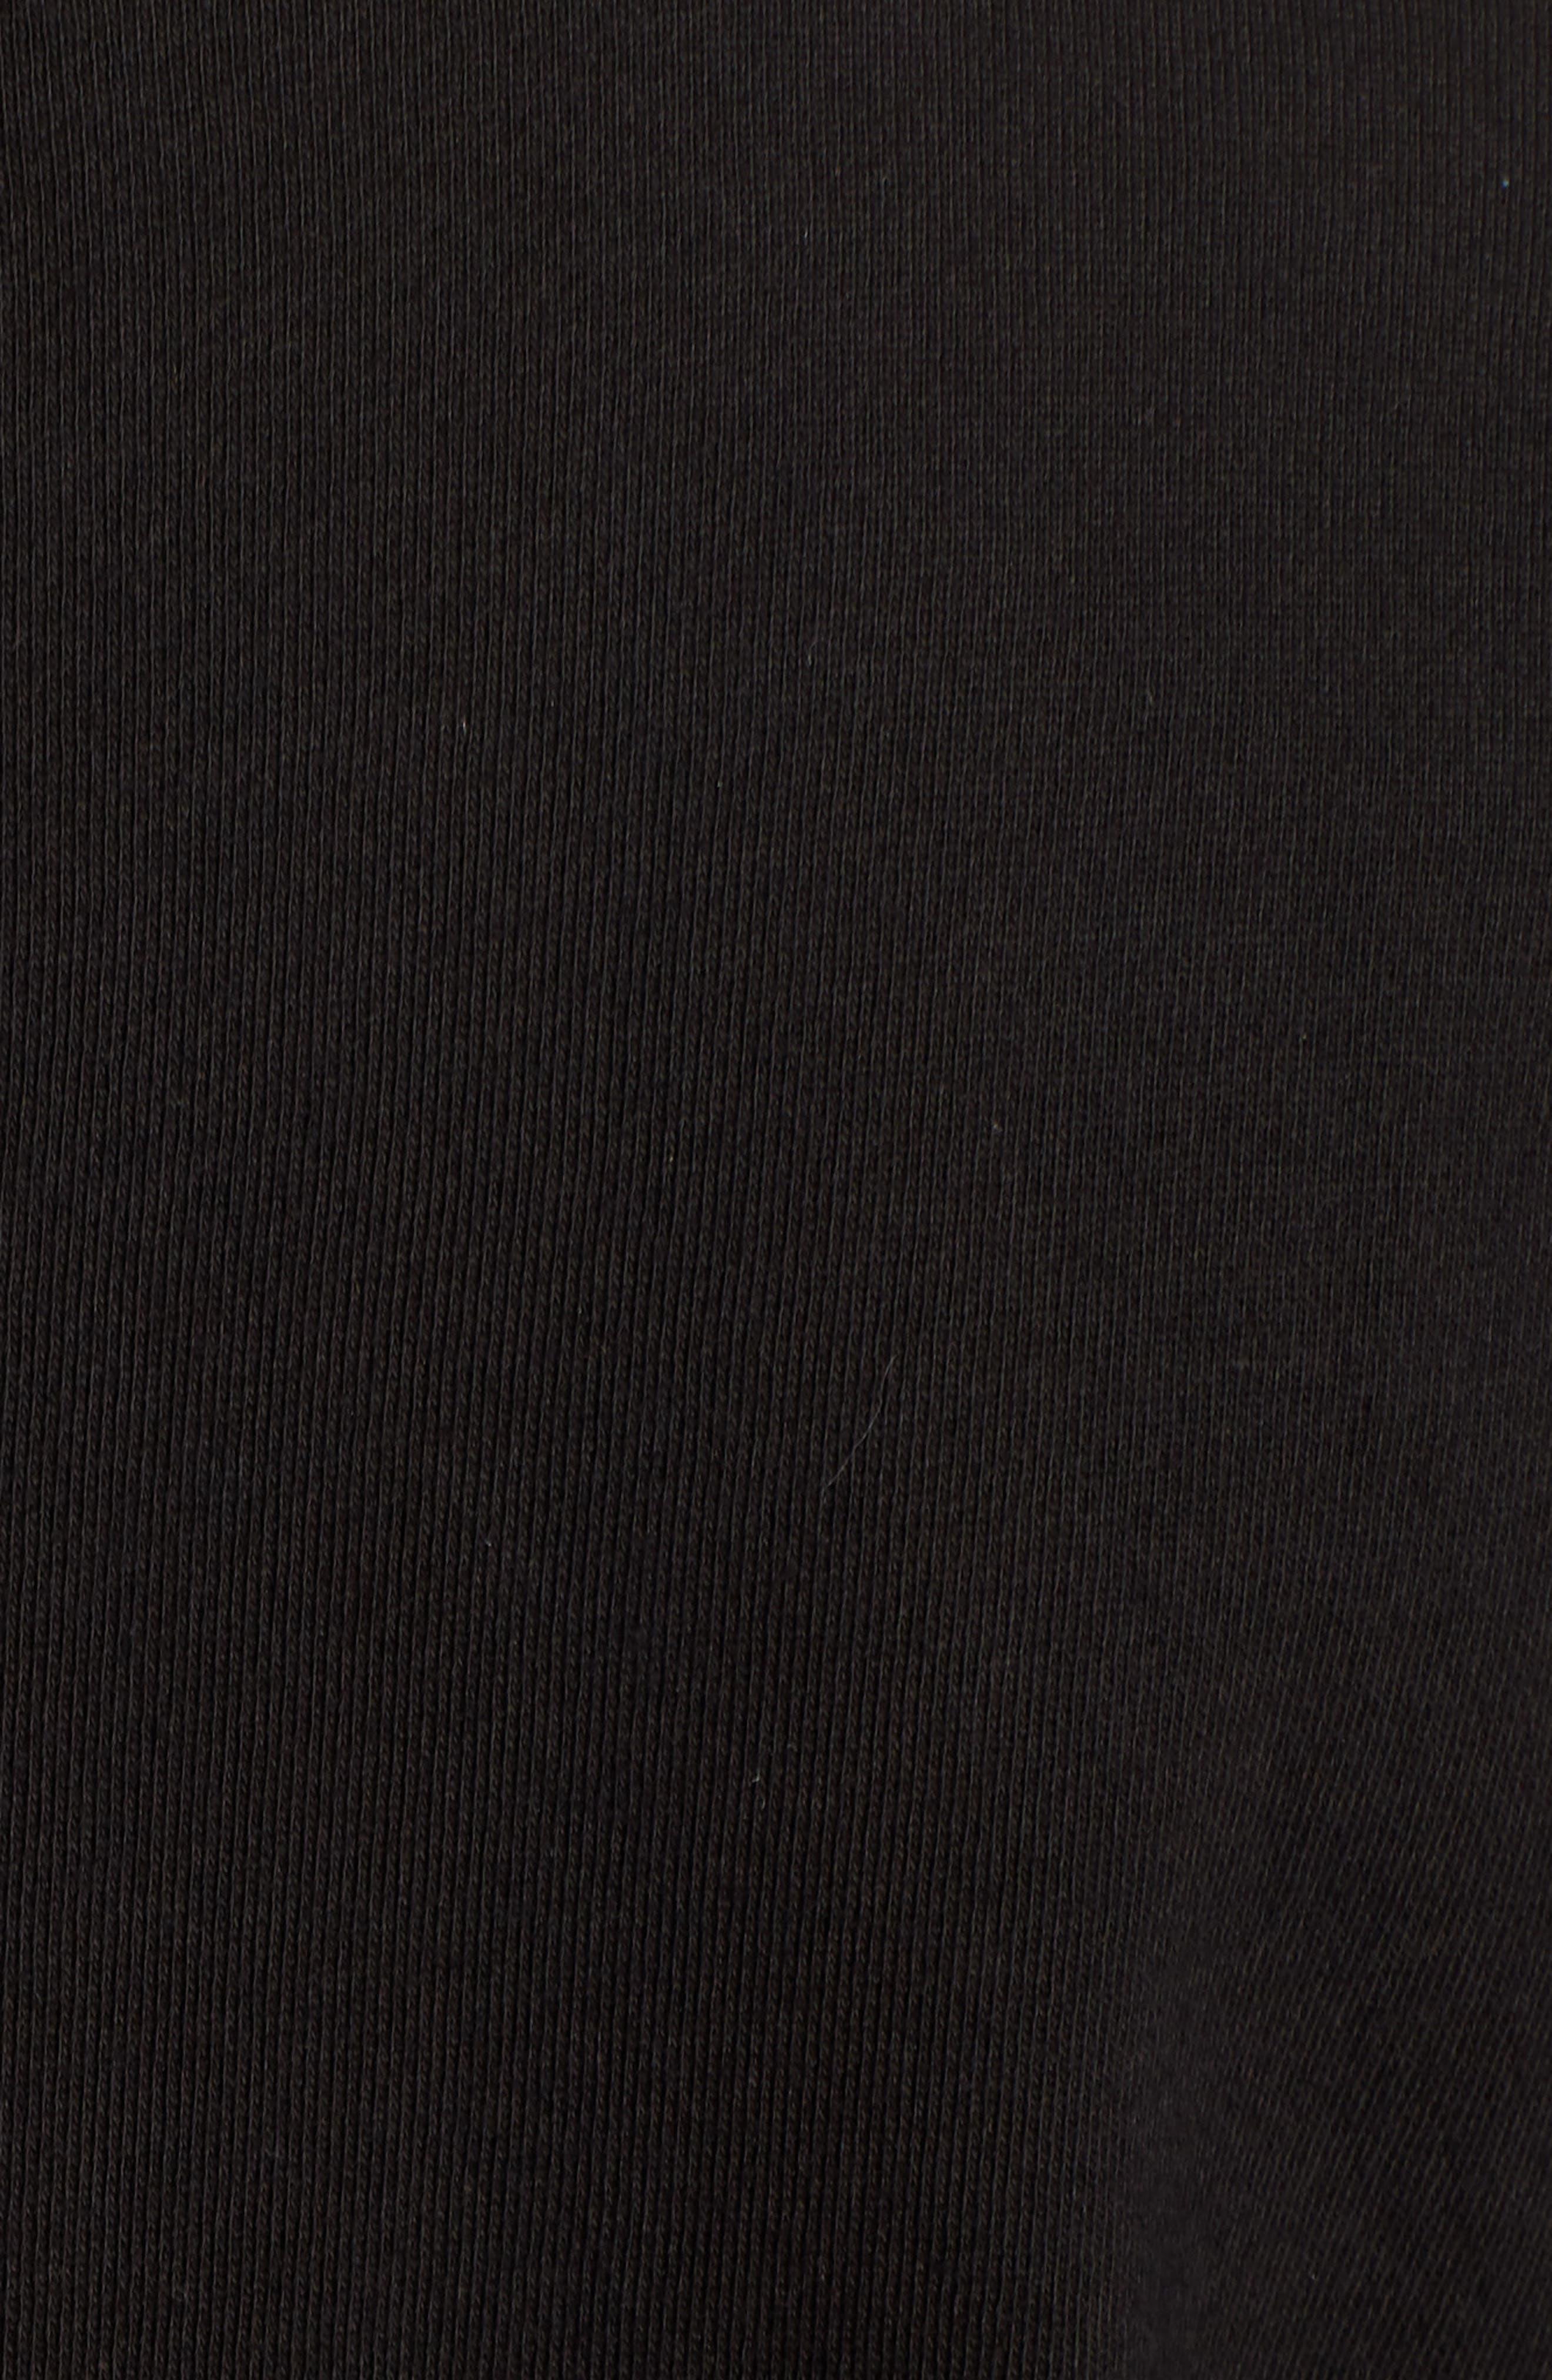 Cotton Blend Knit Blazer,                             Alternate thumbnail 5, color,                             Black